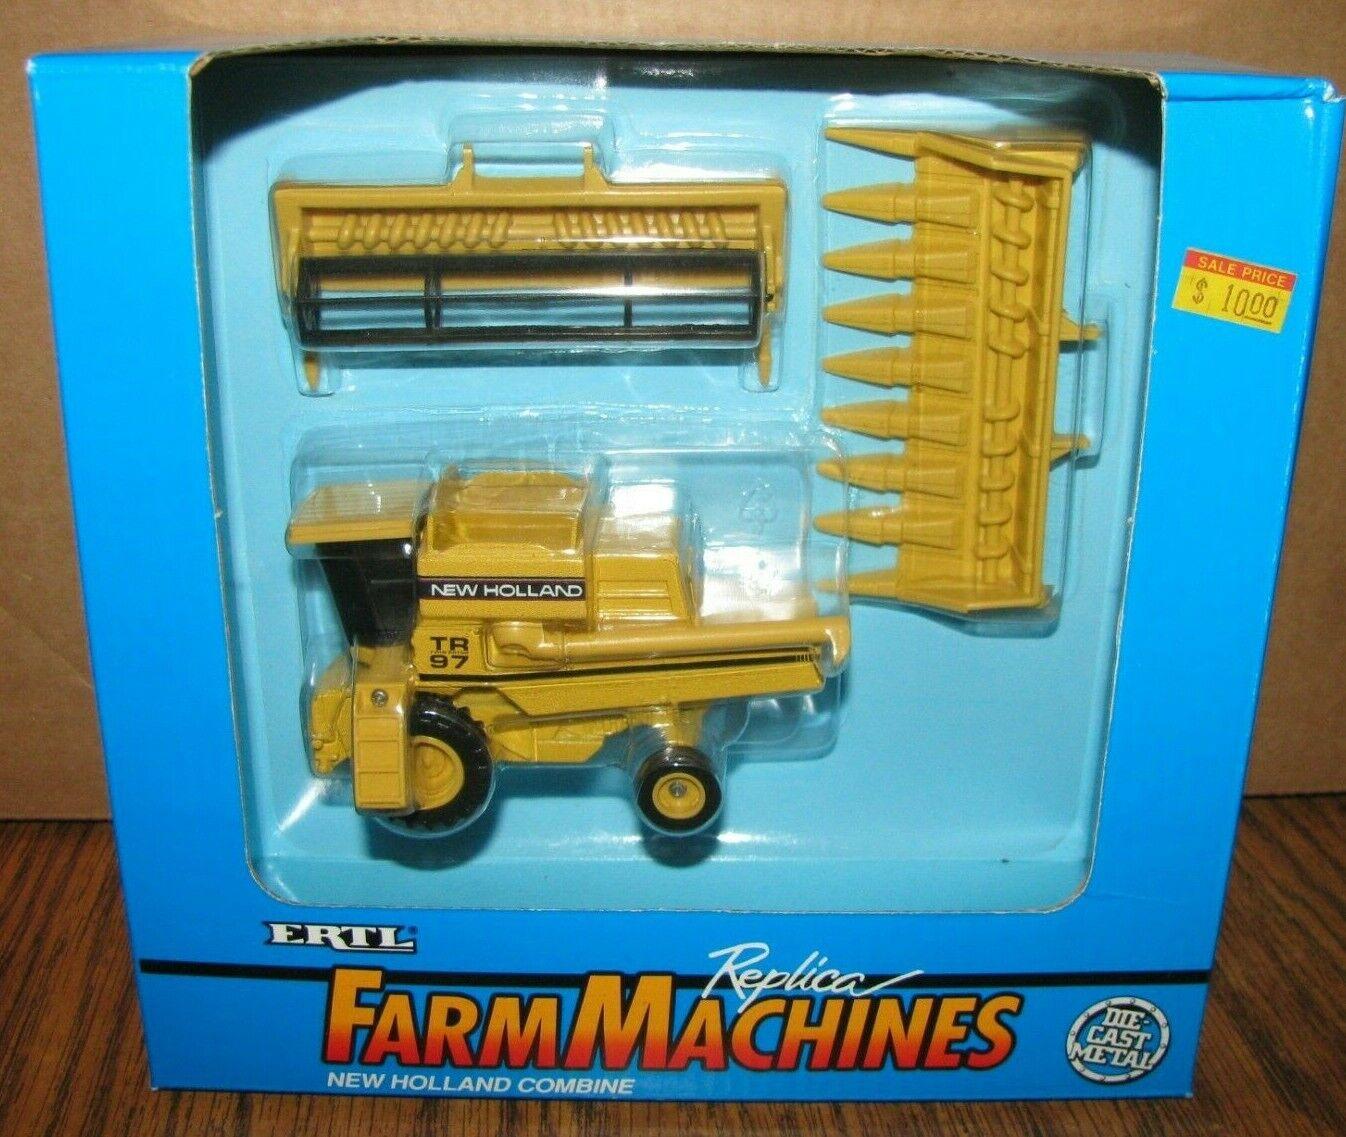 New Holland TR97 Combine 1/64 Ertl Toy #815 Grain & Corn Heads 1994 Farm Machine